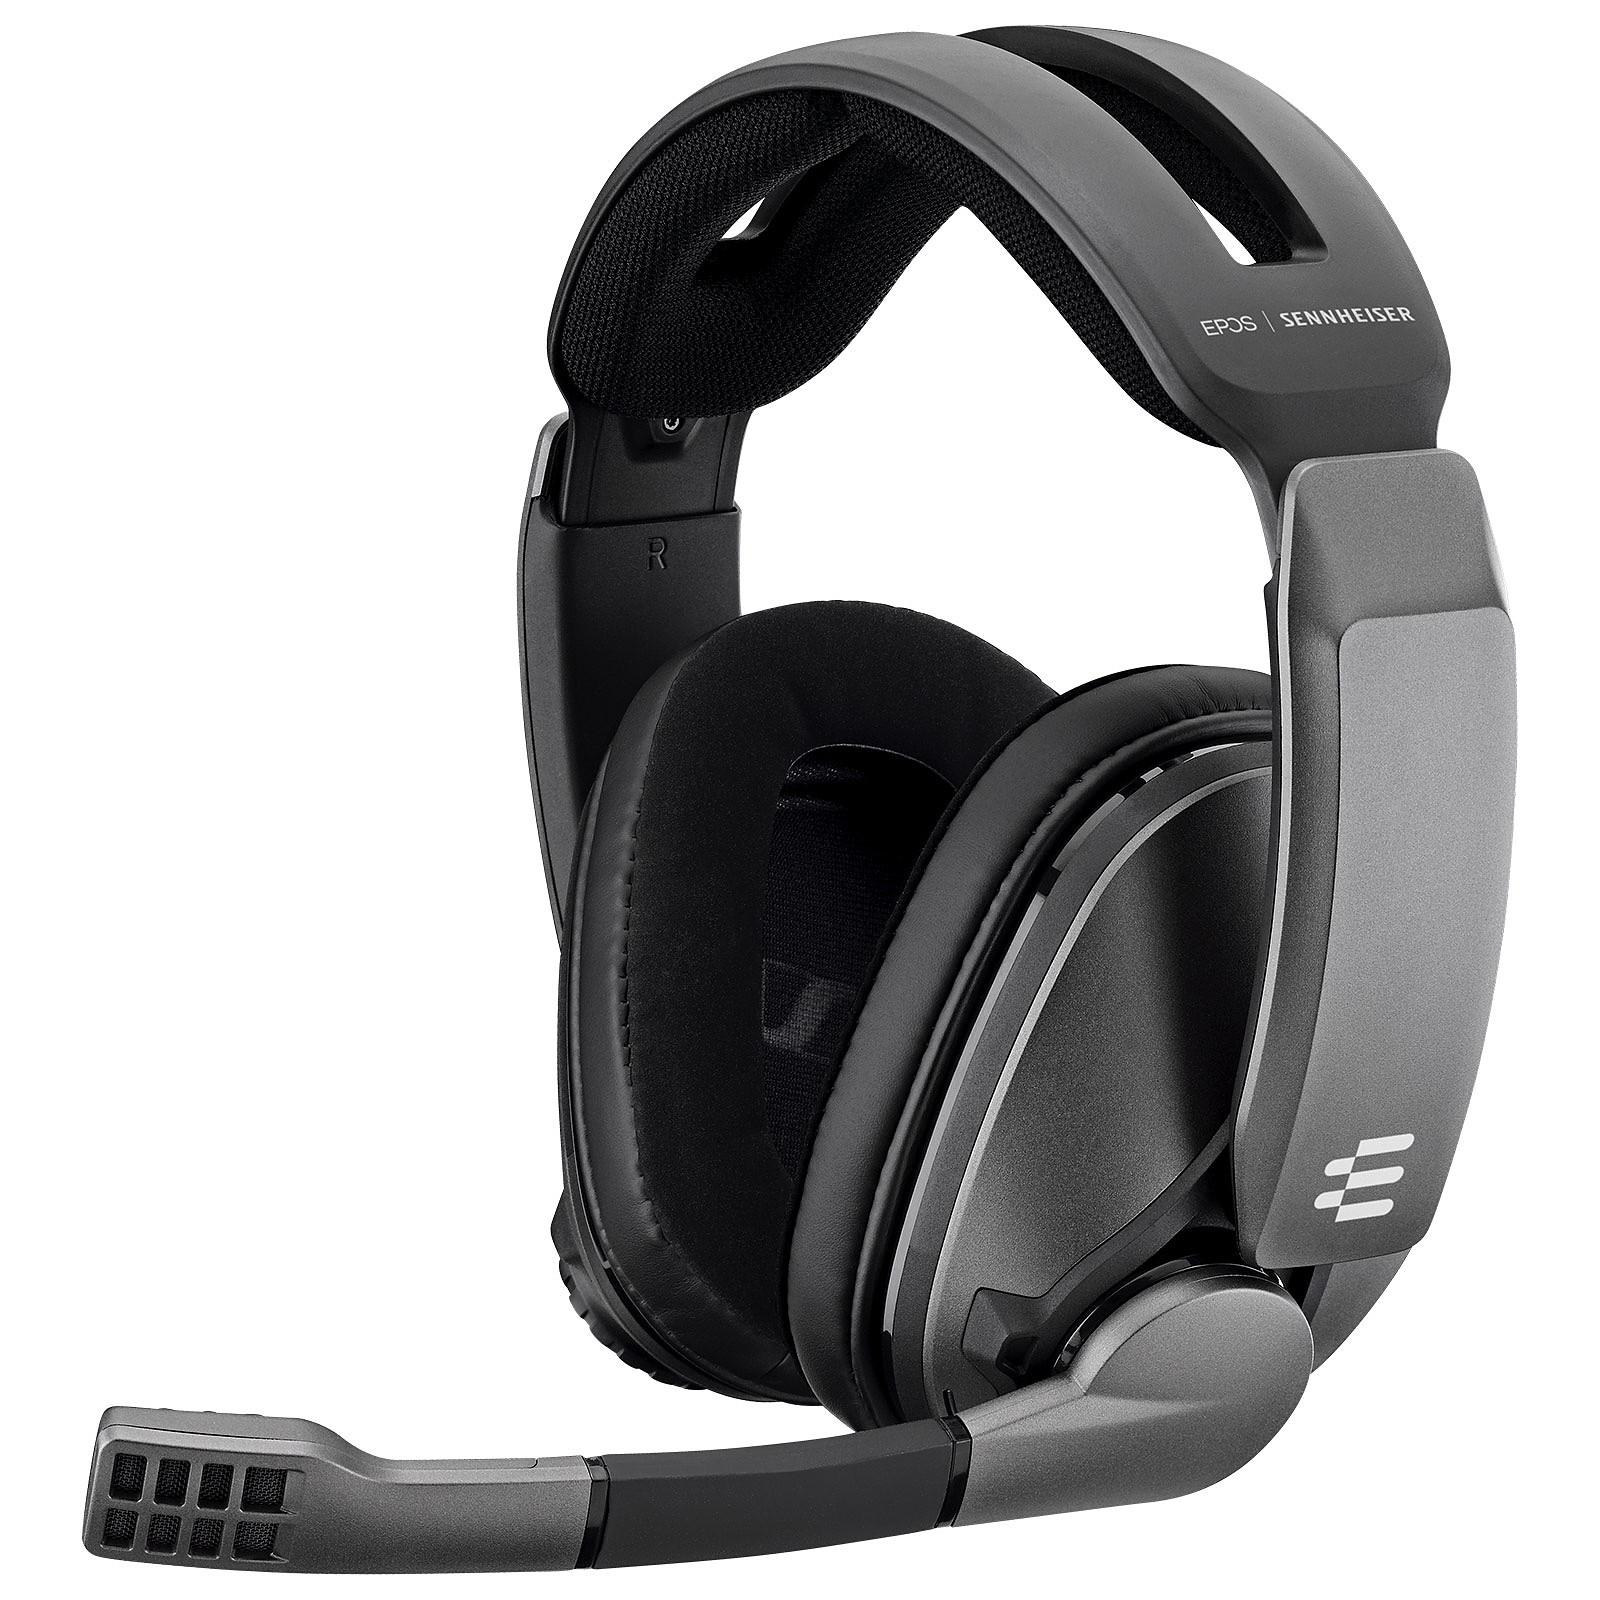 Casque audio sans-fil Epos Sennheiser GSP 370 - son Surround 7.1